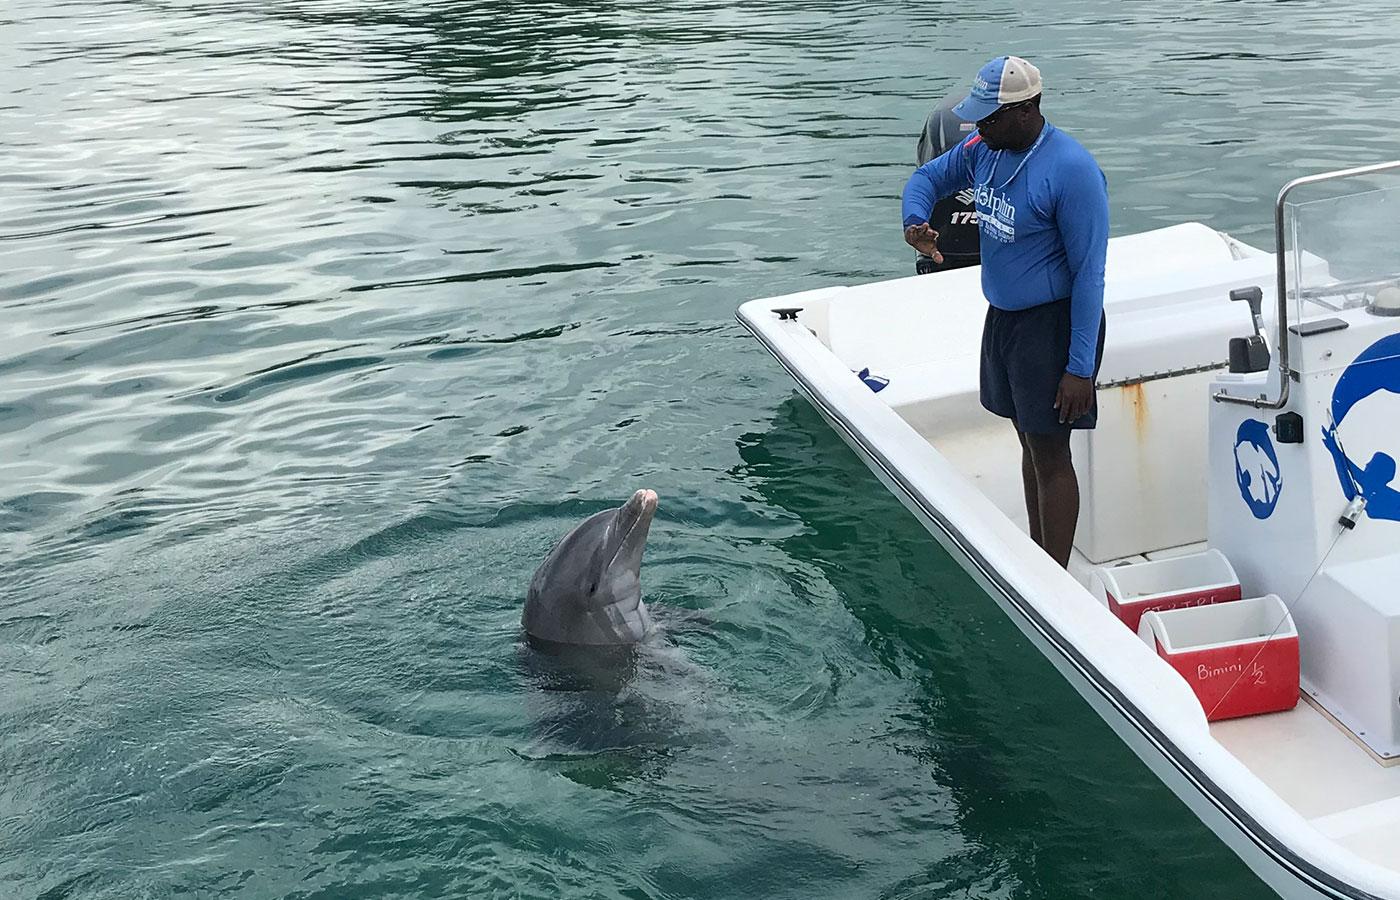 Bahamas Rendezvous 2019 [Day 3]